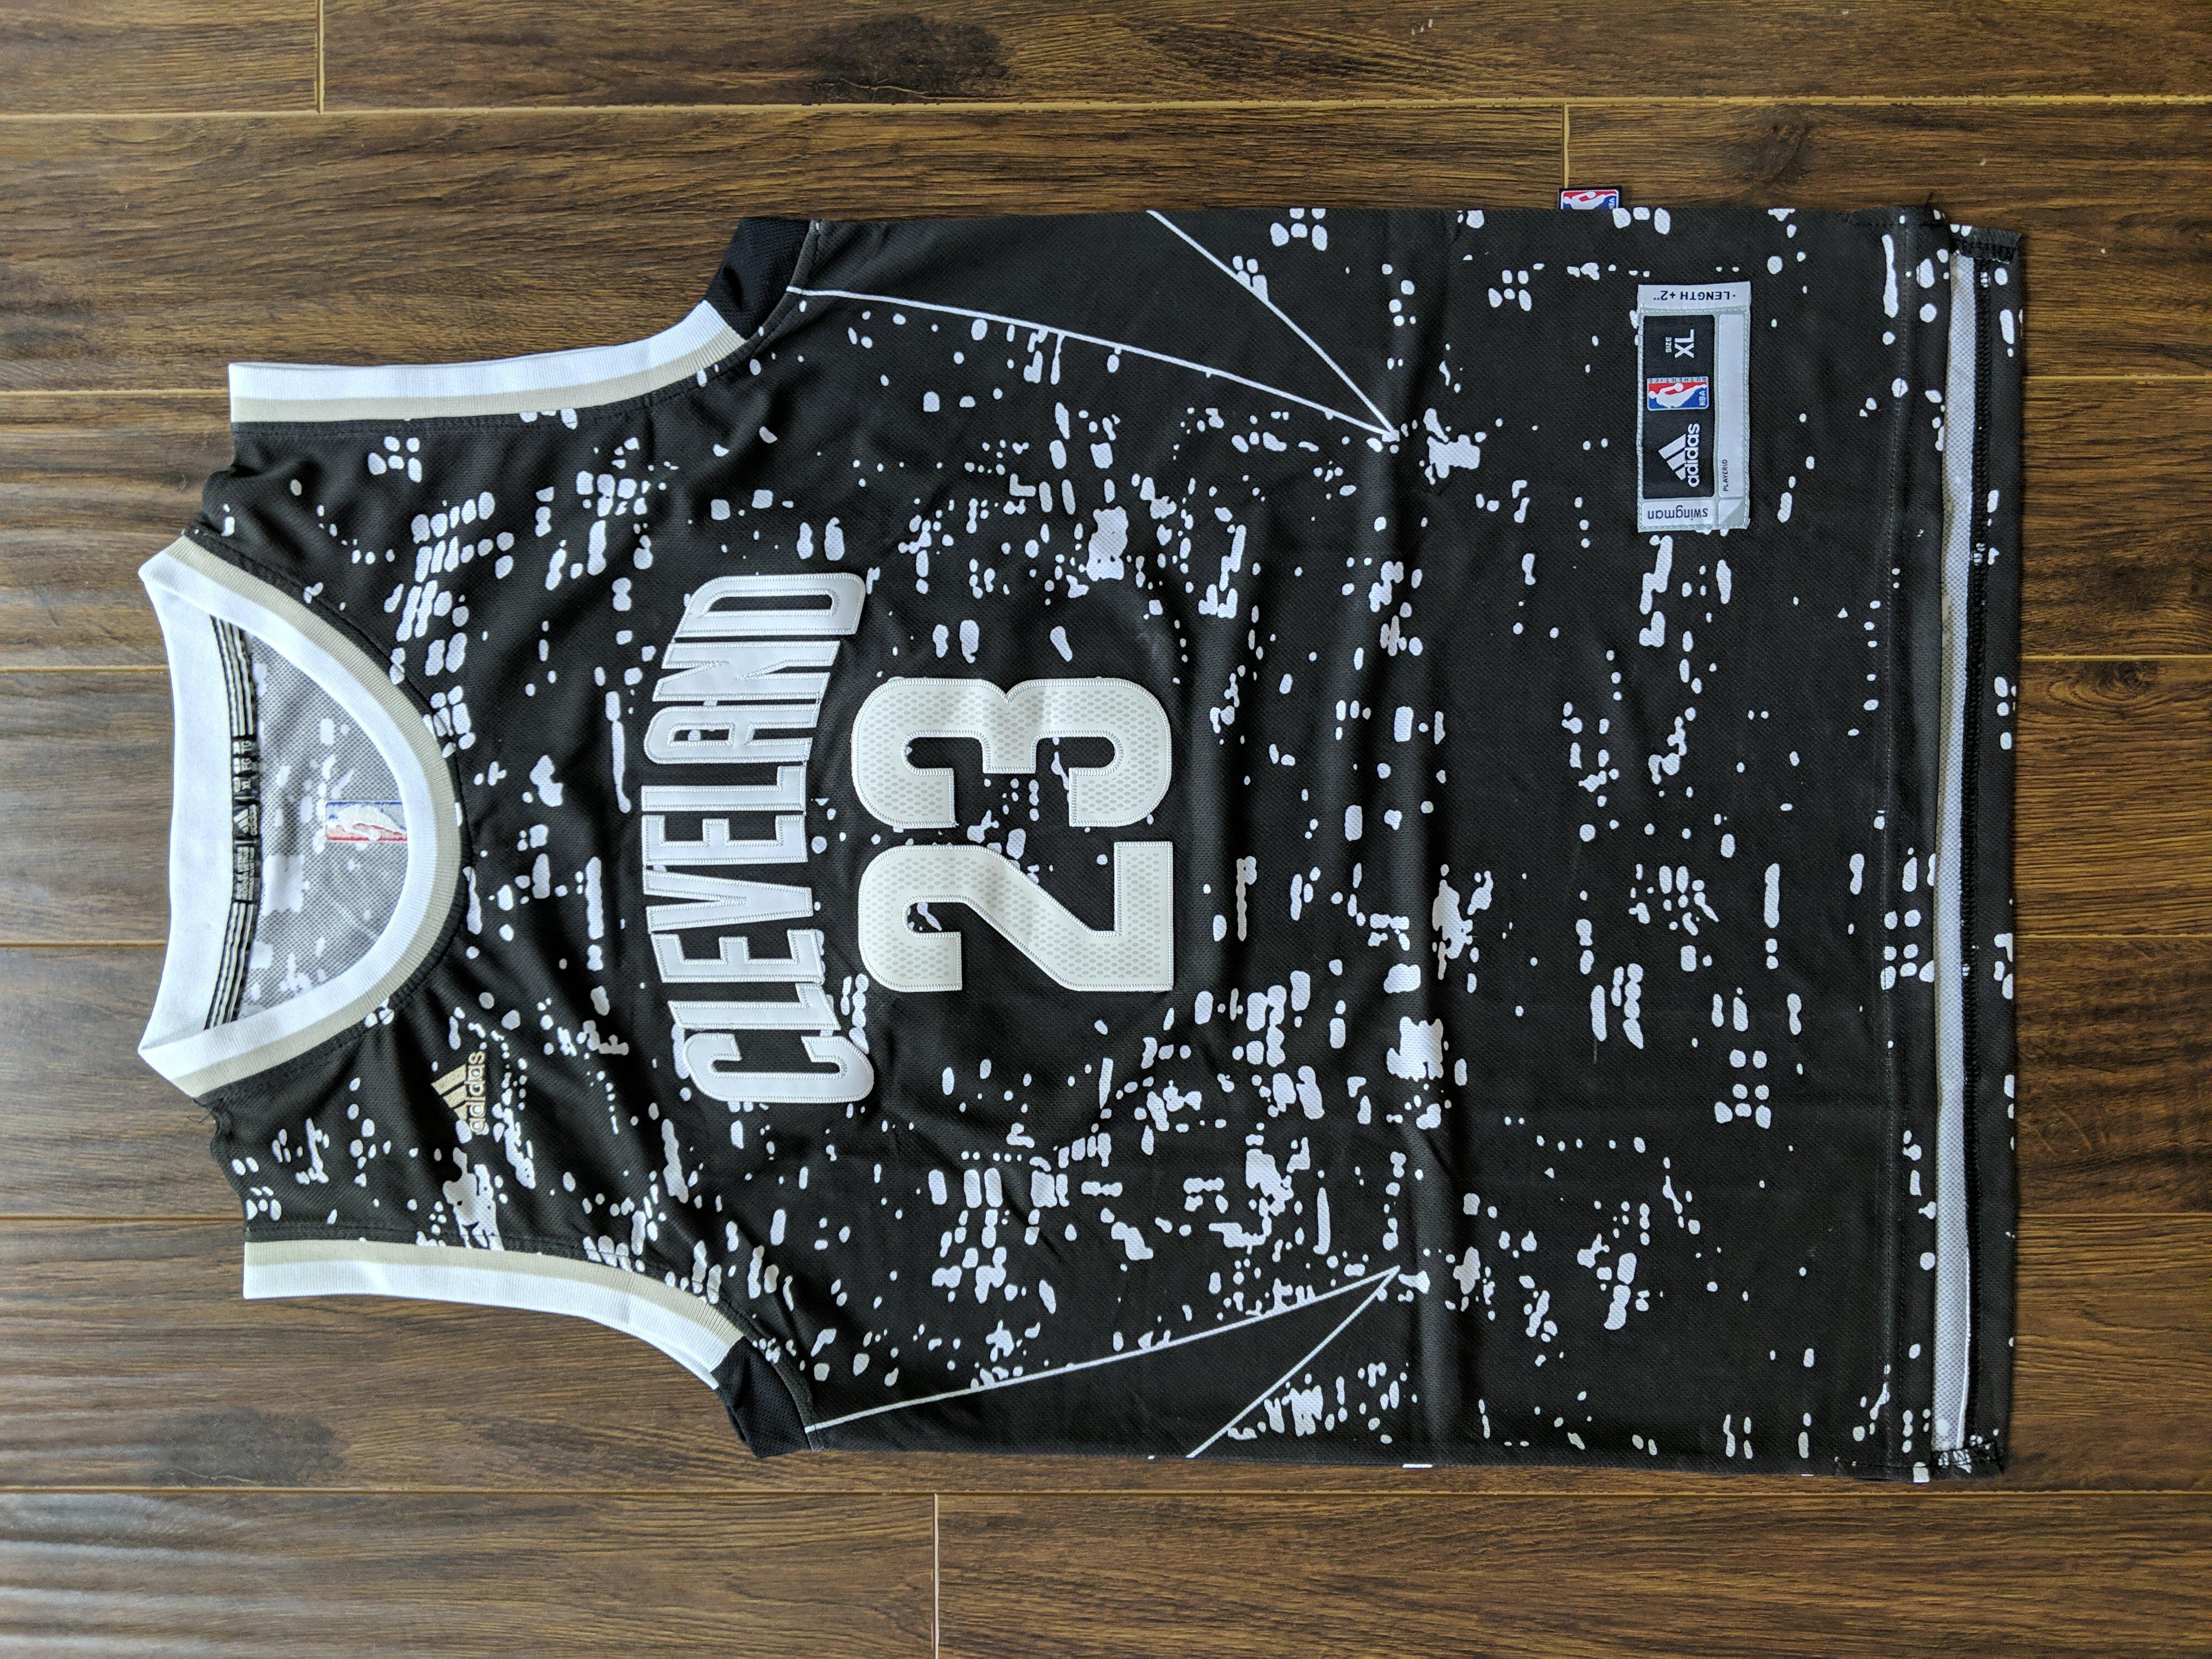 Adidas LeBron James Swingman Camo Jersey